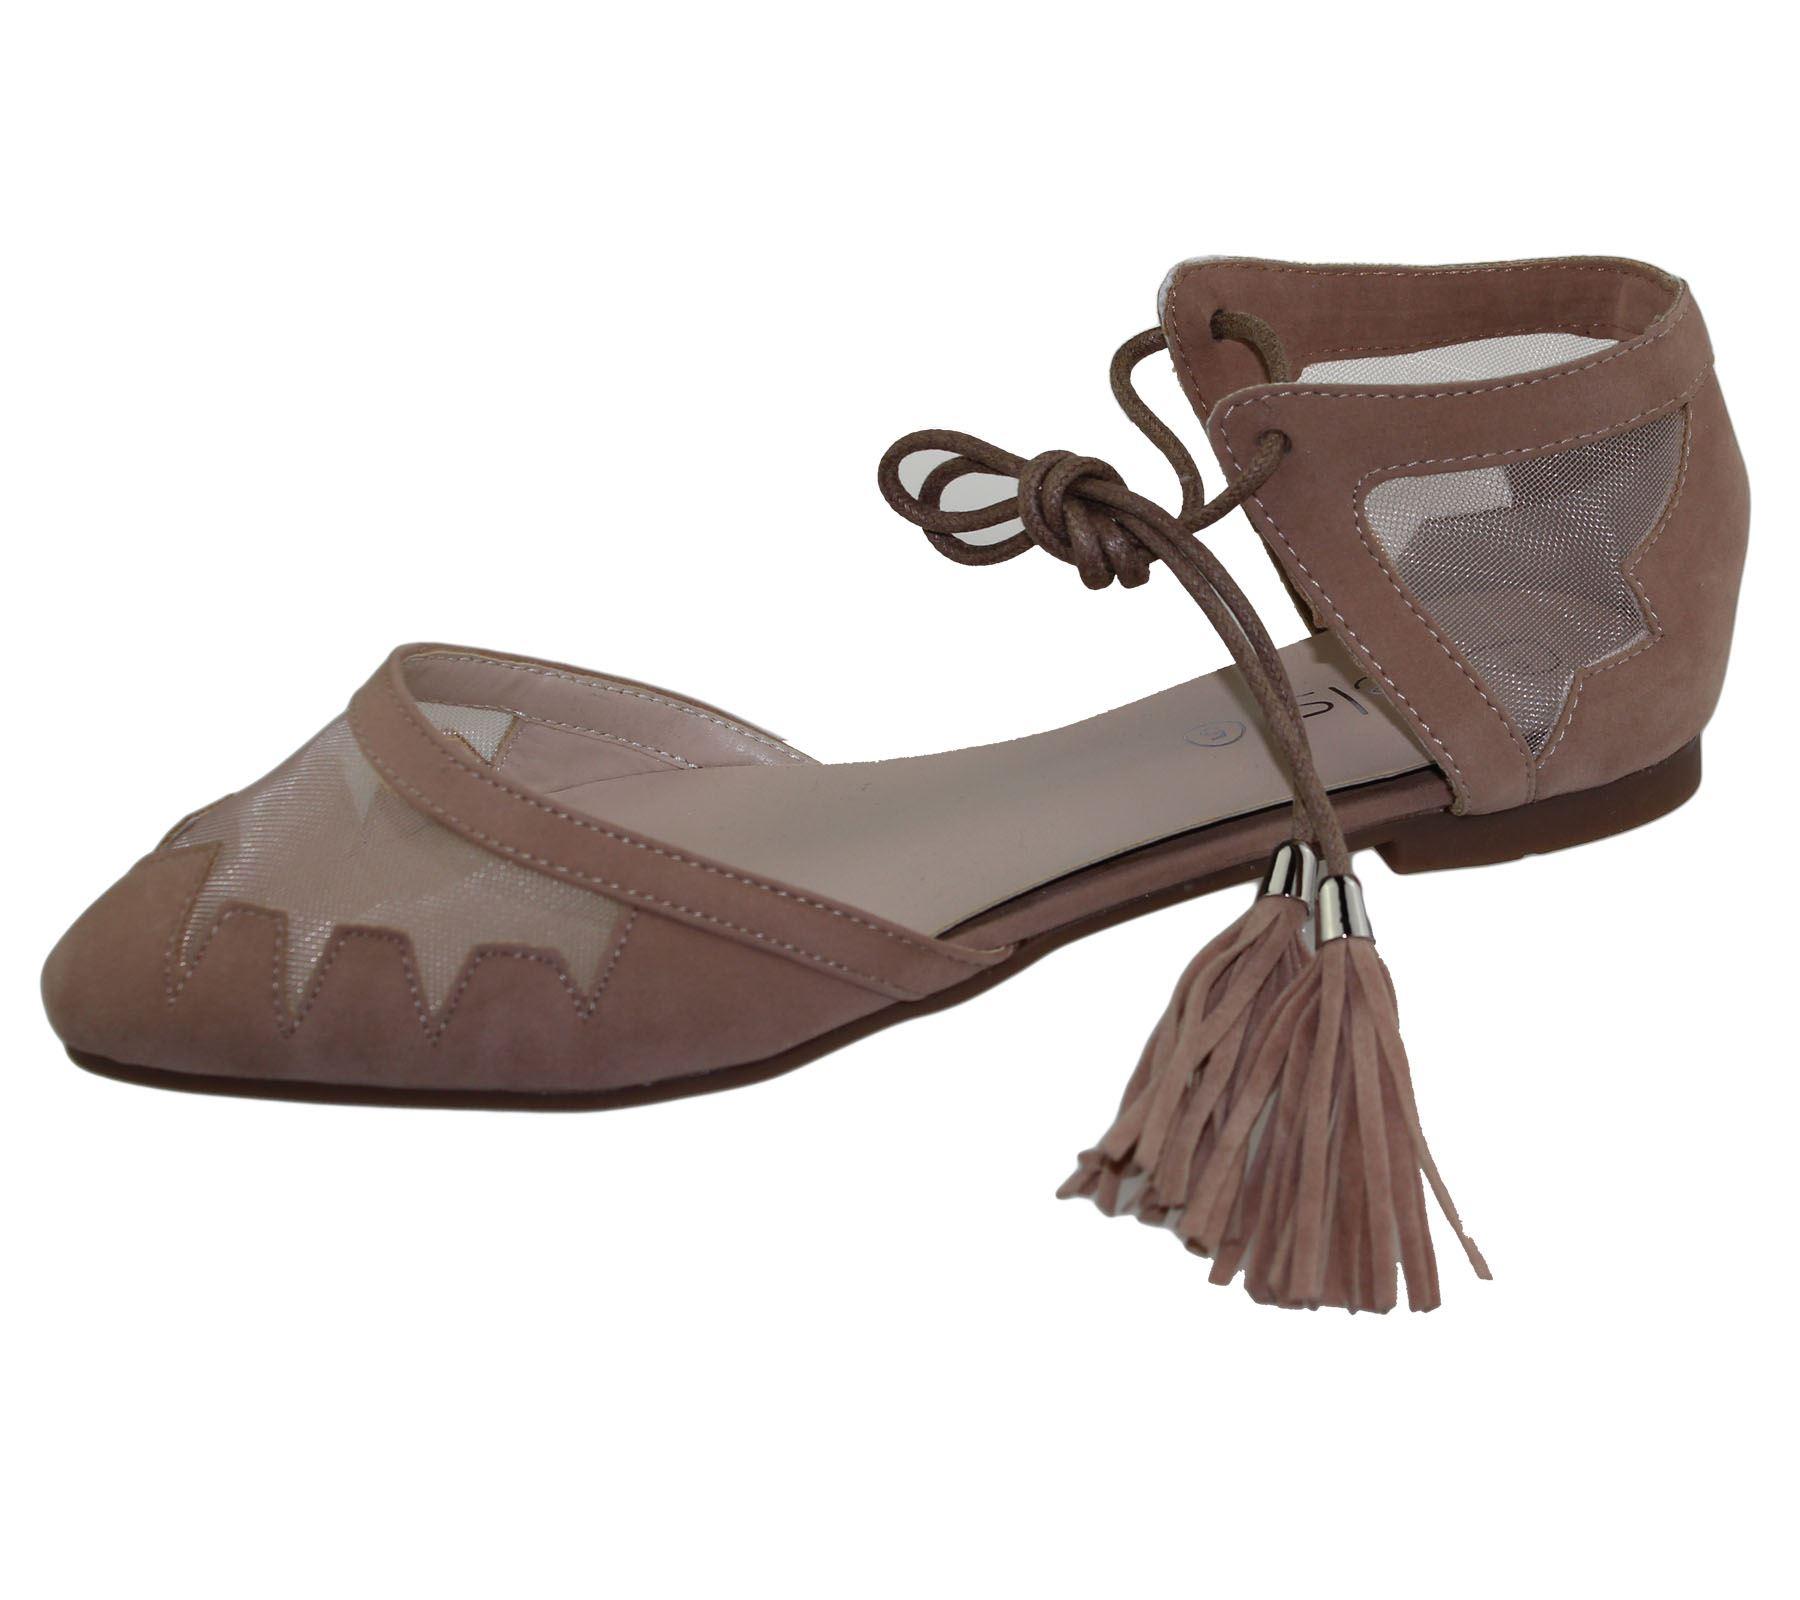 Womens-Flat-Ballerina-Dolly-Pumps-Ballet-Ladies-Summer-Mesh-Tassel-Shoes-Sandals thumbnail 24